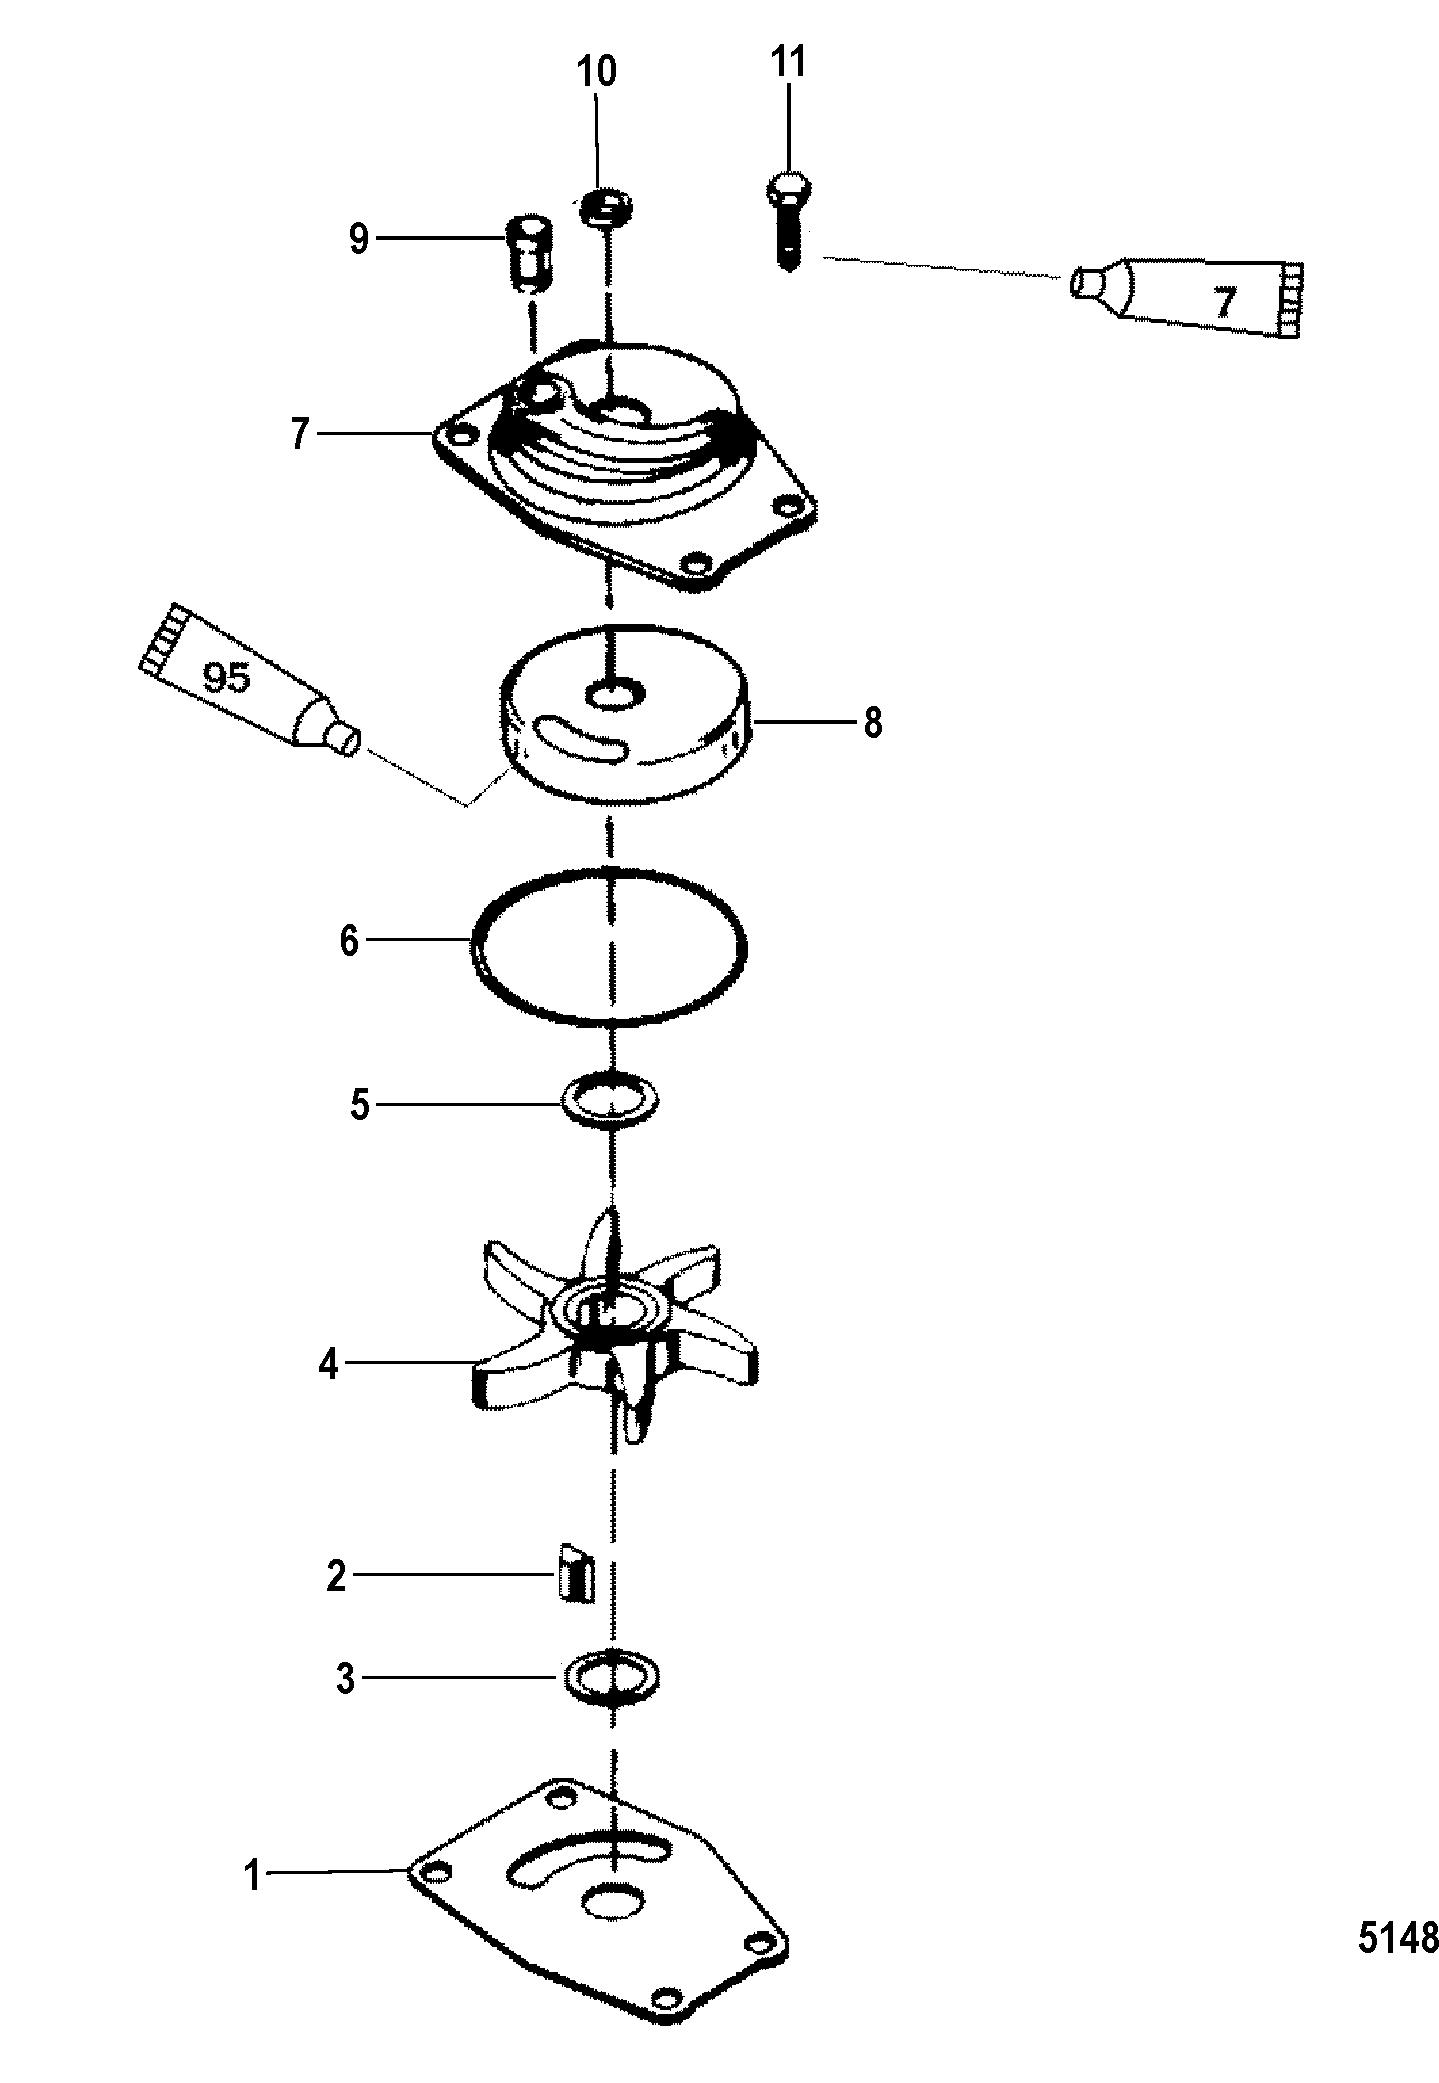 Wondrous Wiring Diagram 323Cc Mercury Auto Electrical Wiring Diagram Wiring 101 Capemaxxcnl